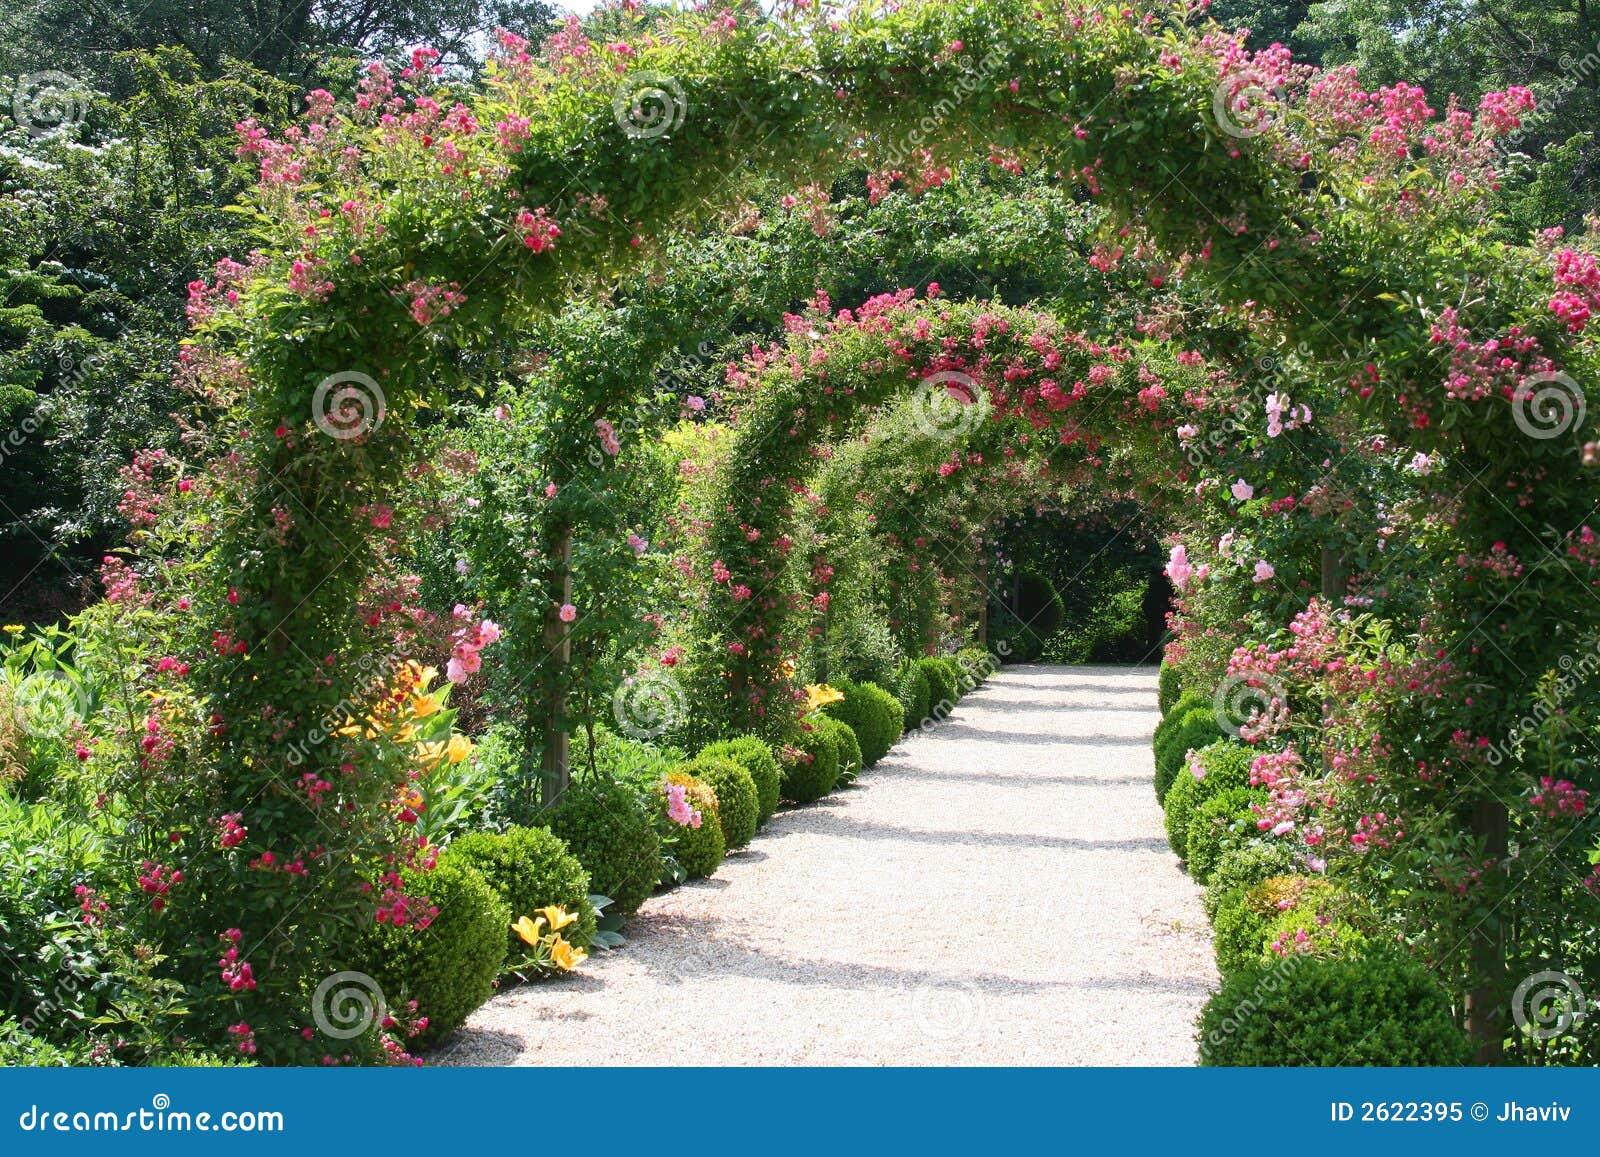 Rose garden landscape royalty free stock photo image for Sample garden landscape